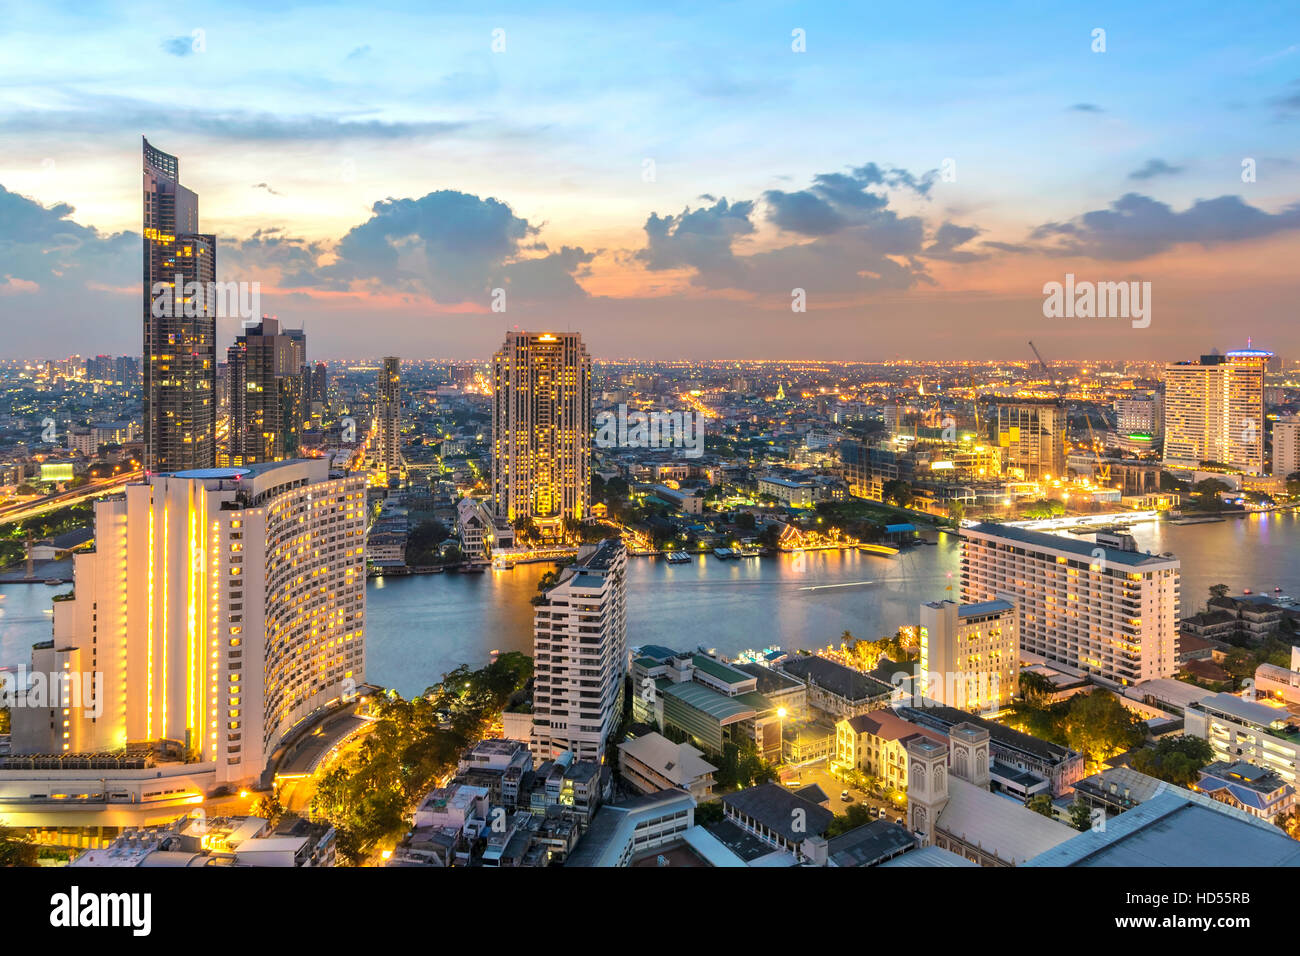 Dämmerung Himmel in Bangkok anzeigen an 37 Stock Lebua Bild aufgenommen baut .front Thonburi Bezirk Stockbild